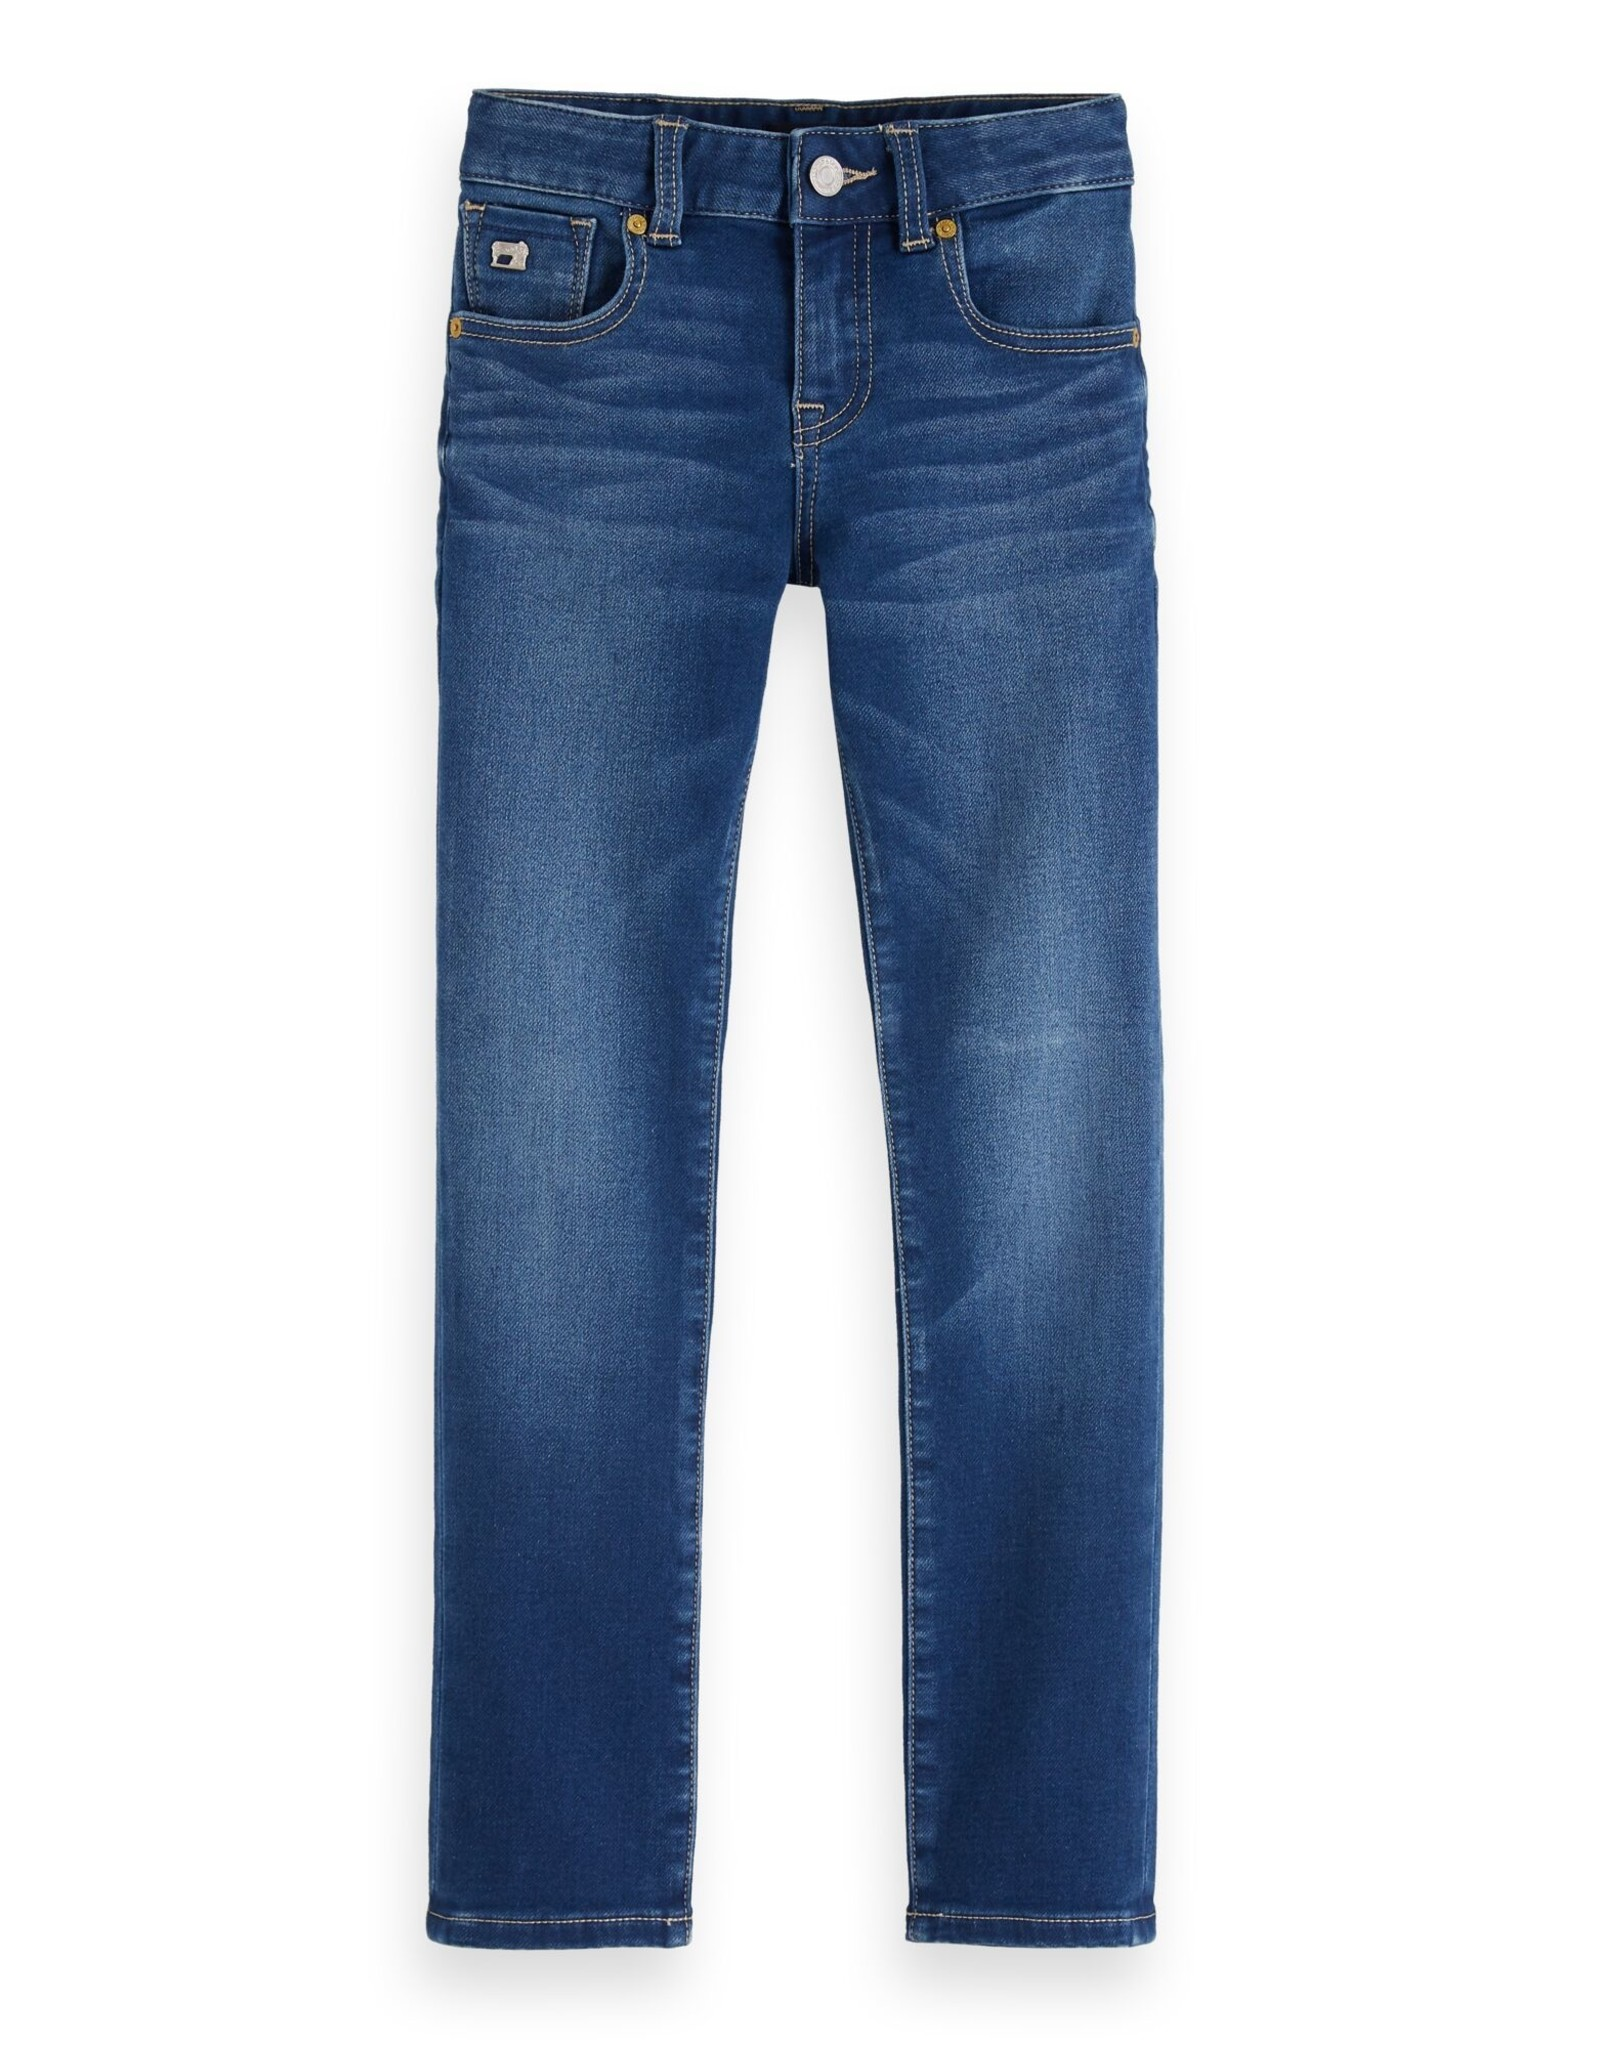 Scotch&Soda Shrunk skinny jeans